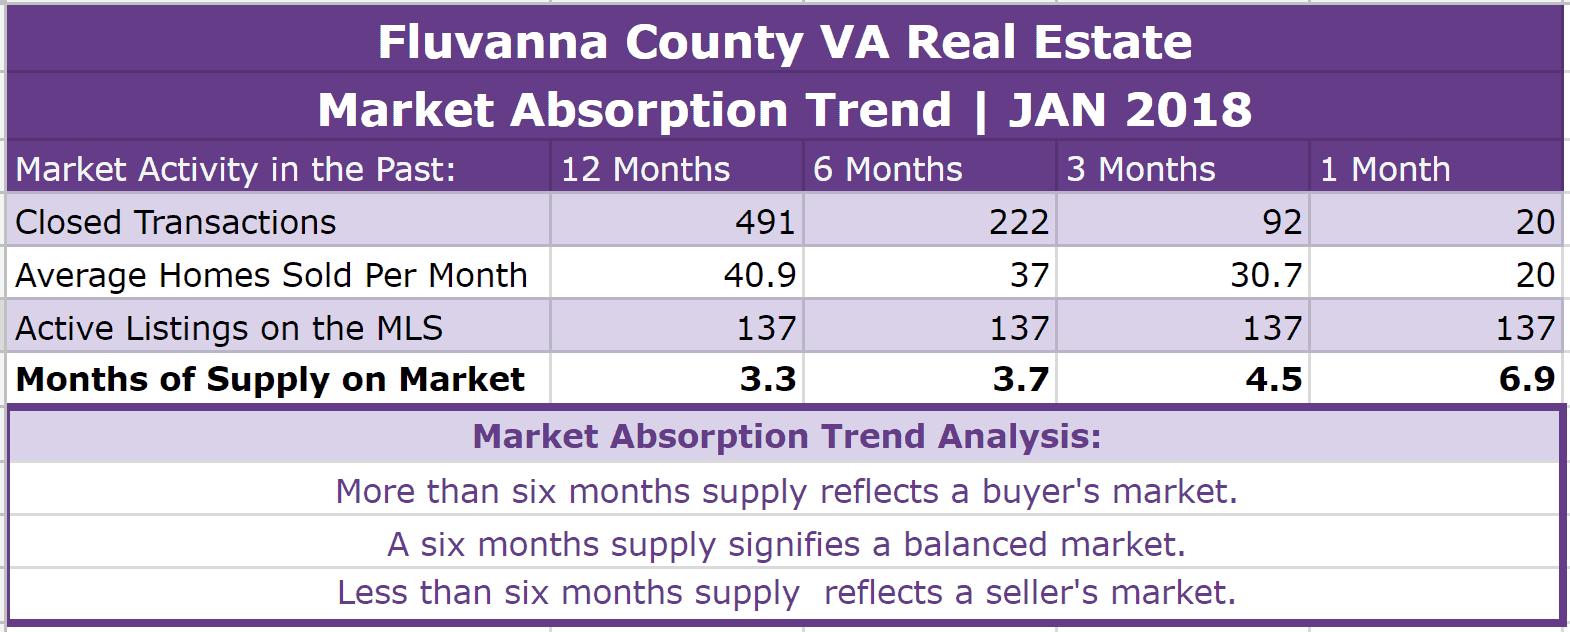 Fluvanna County Real Estate Absorption Trend - JAN 2018